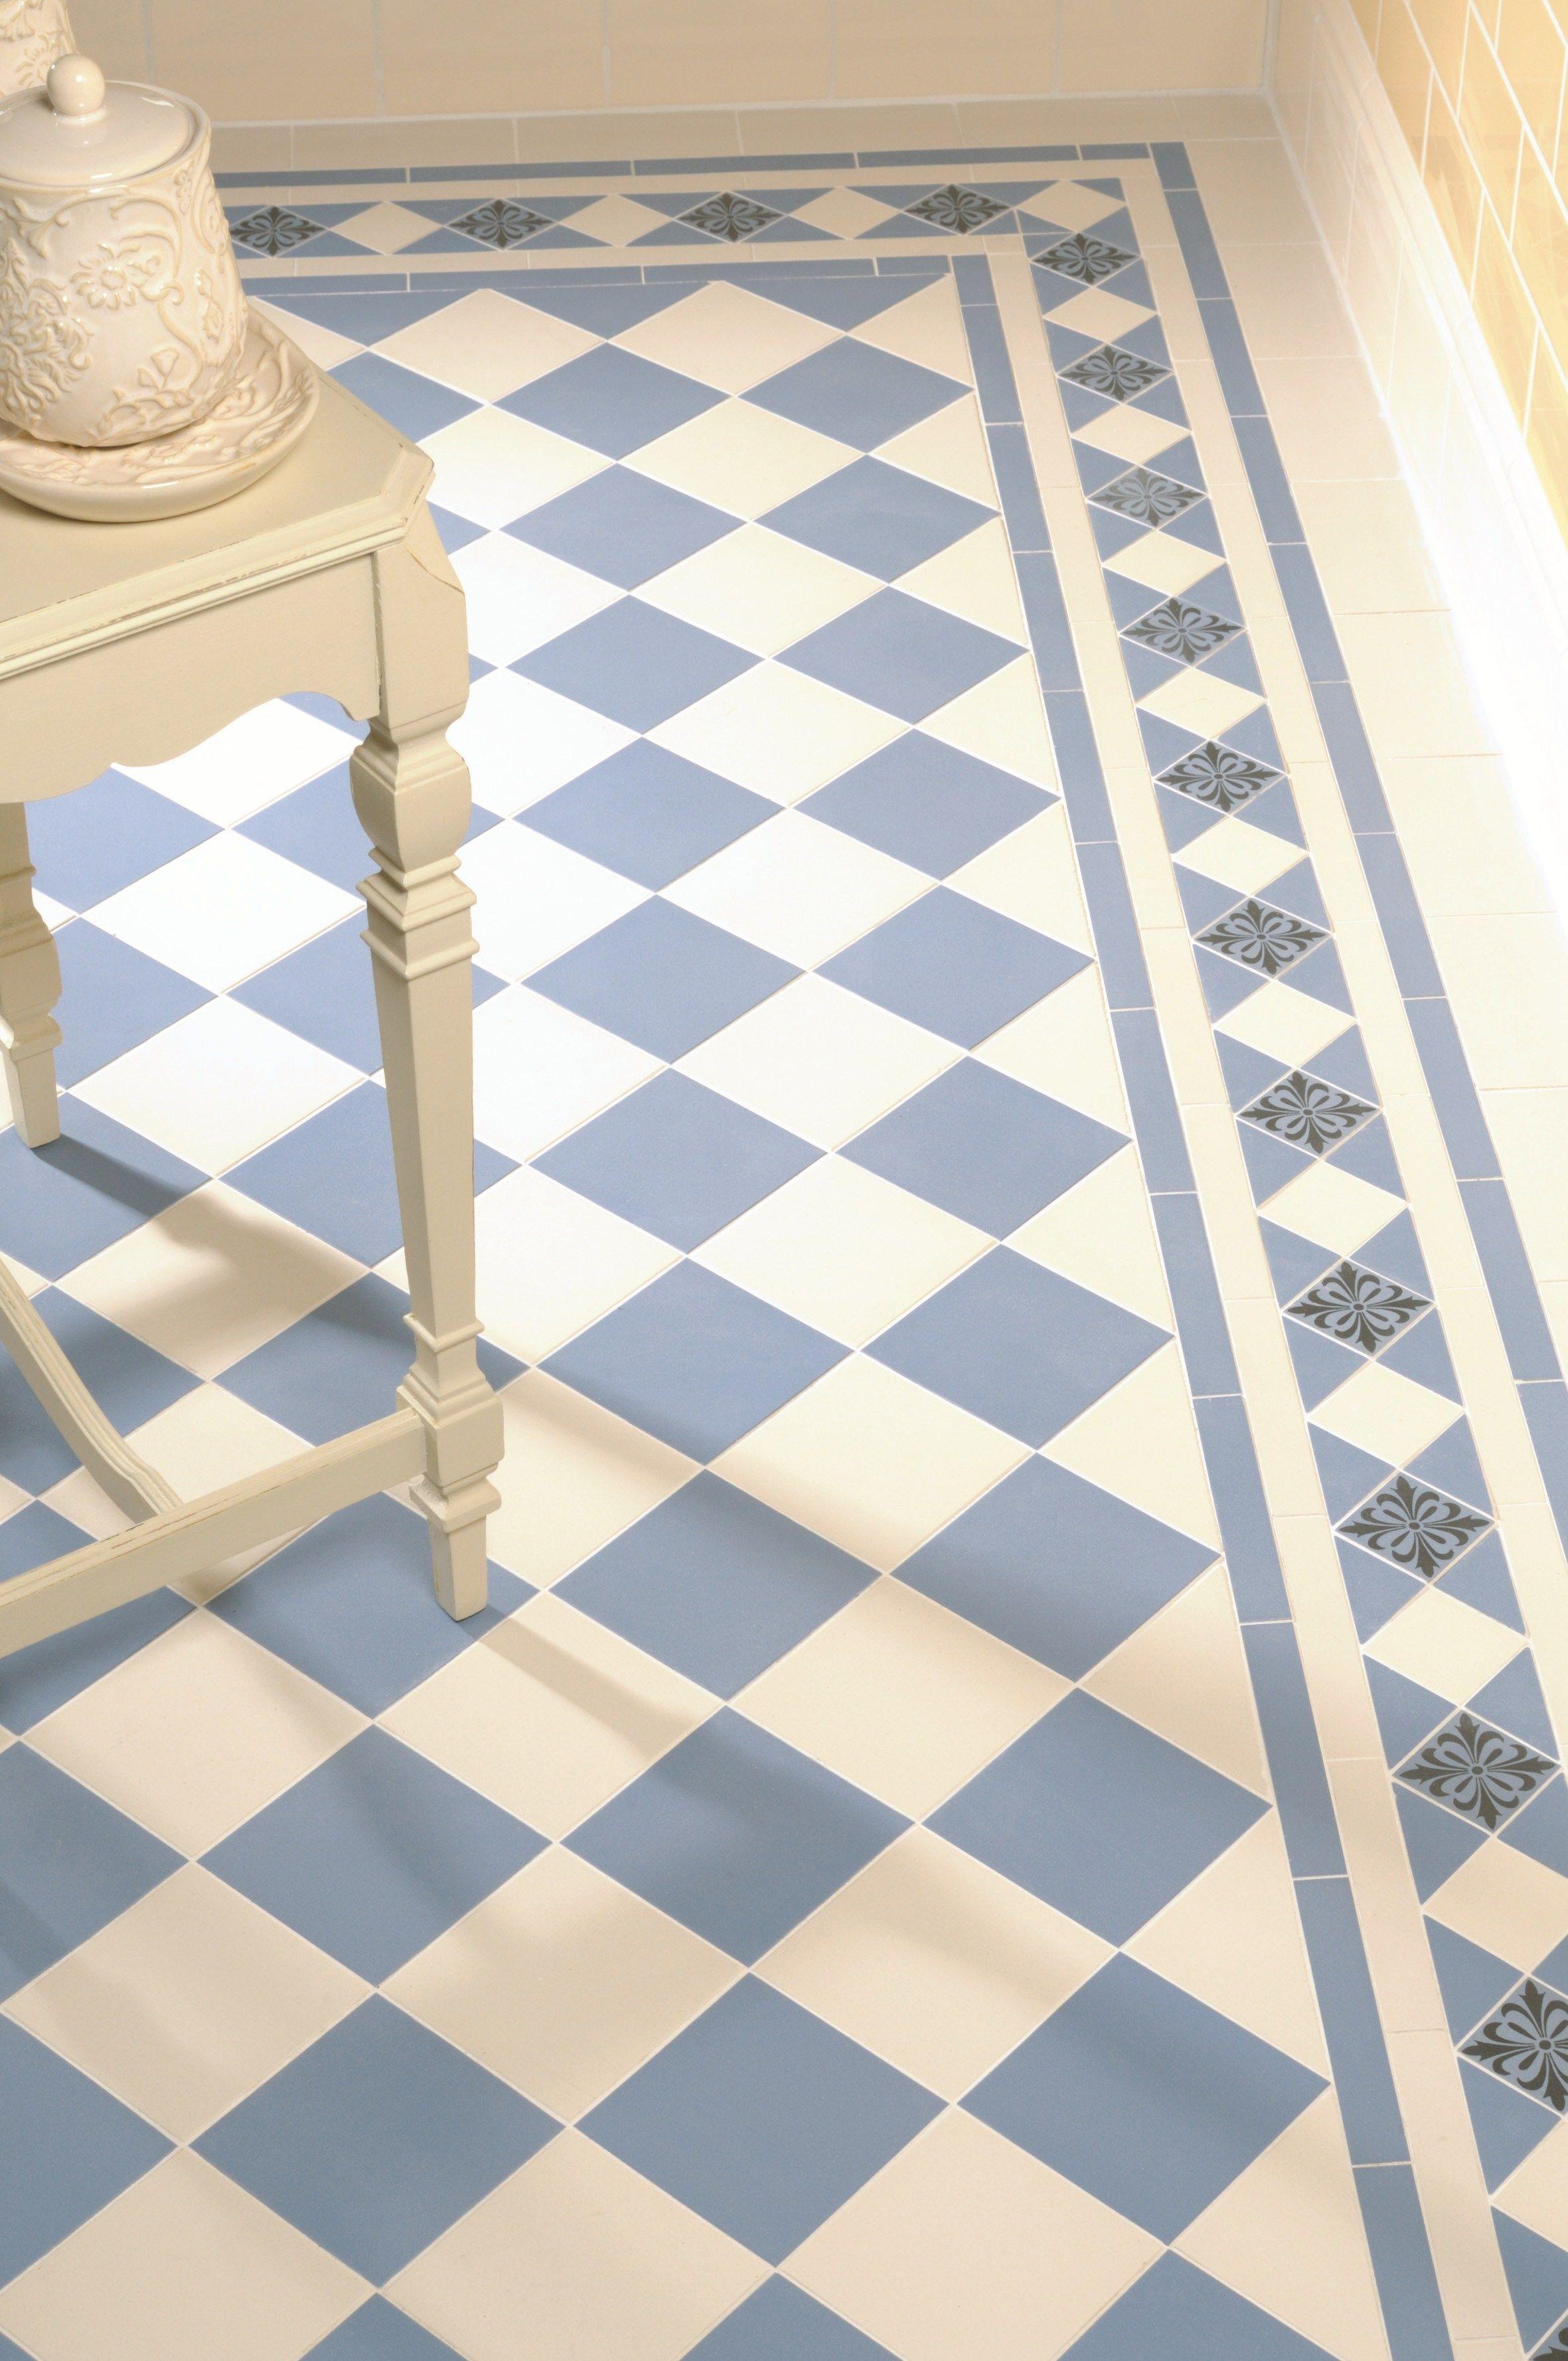 Blue And White Vinyl Flooring Flooring Designs In Size 2362 X 3556 Tile Floor Victorian Bathroom Floor Tile Design